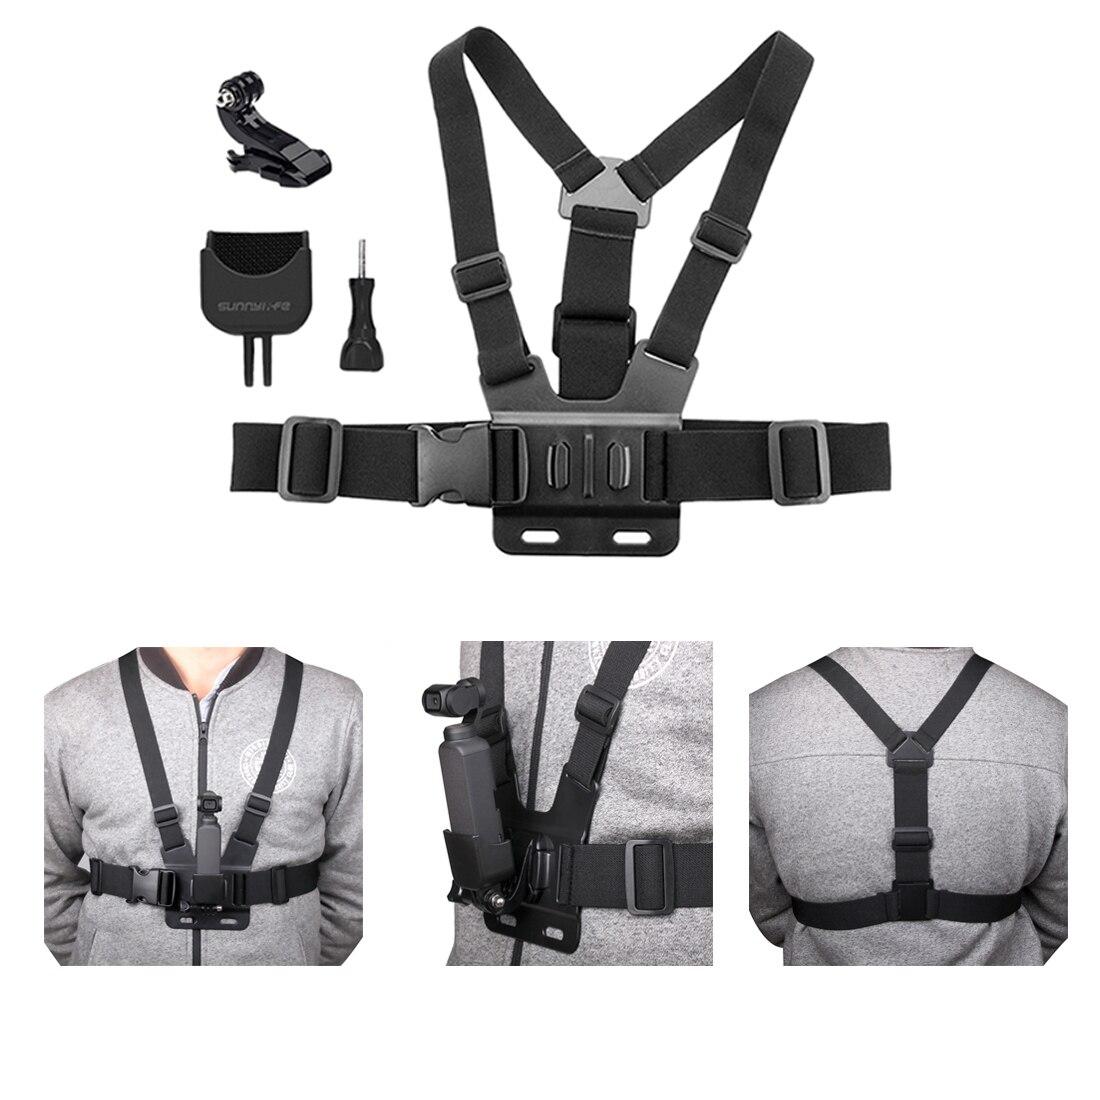 Adjustable Chest Strap Cycling Body Mount Bundle Kit  Adapter for DJI OSMO POCKET GoPro HERO6 / 4/5 Session /HERO5 black